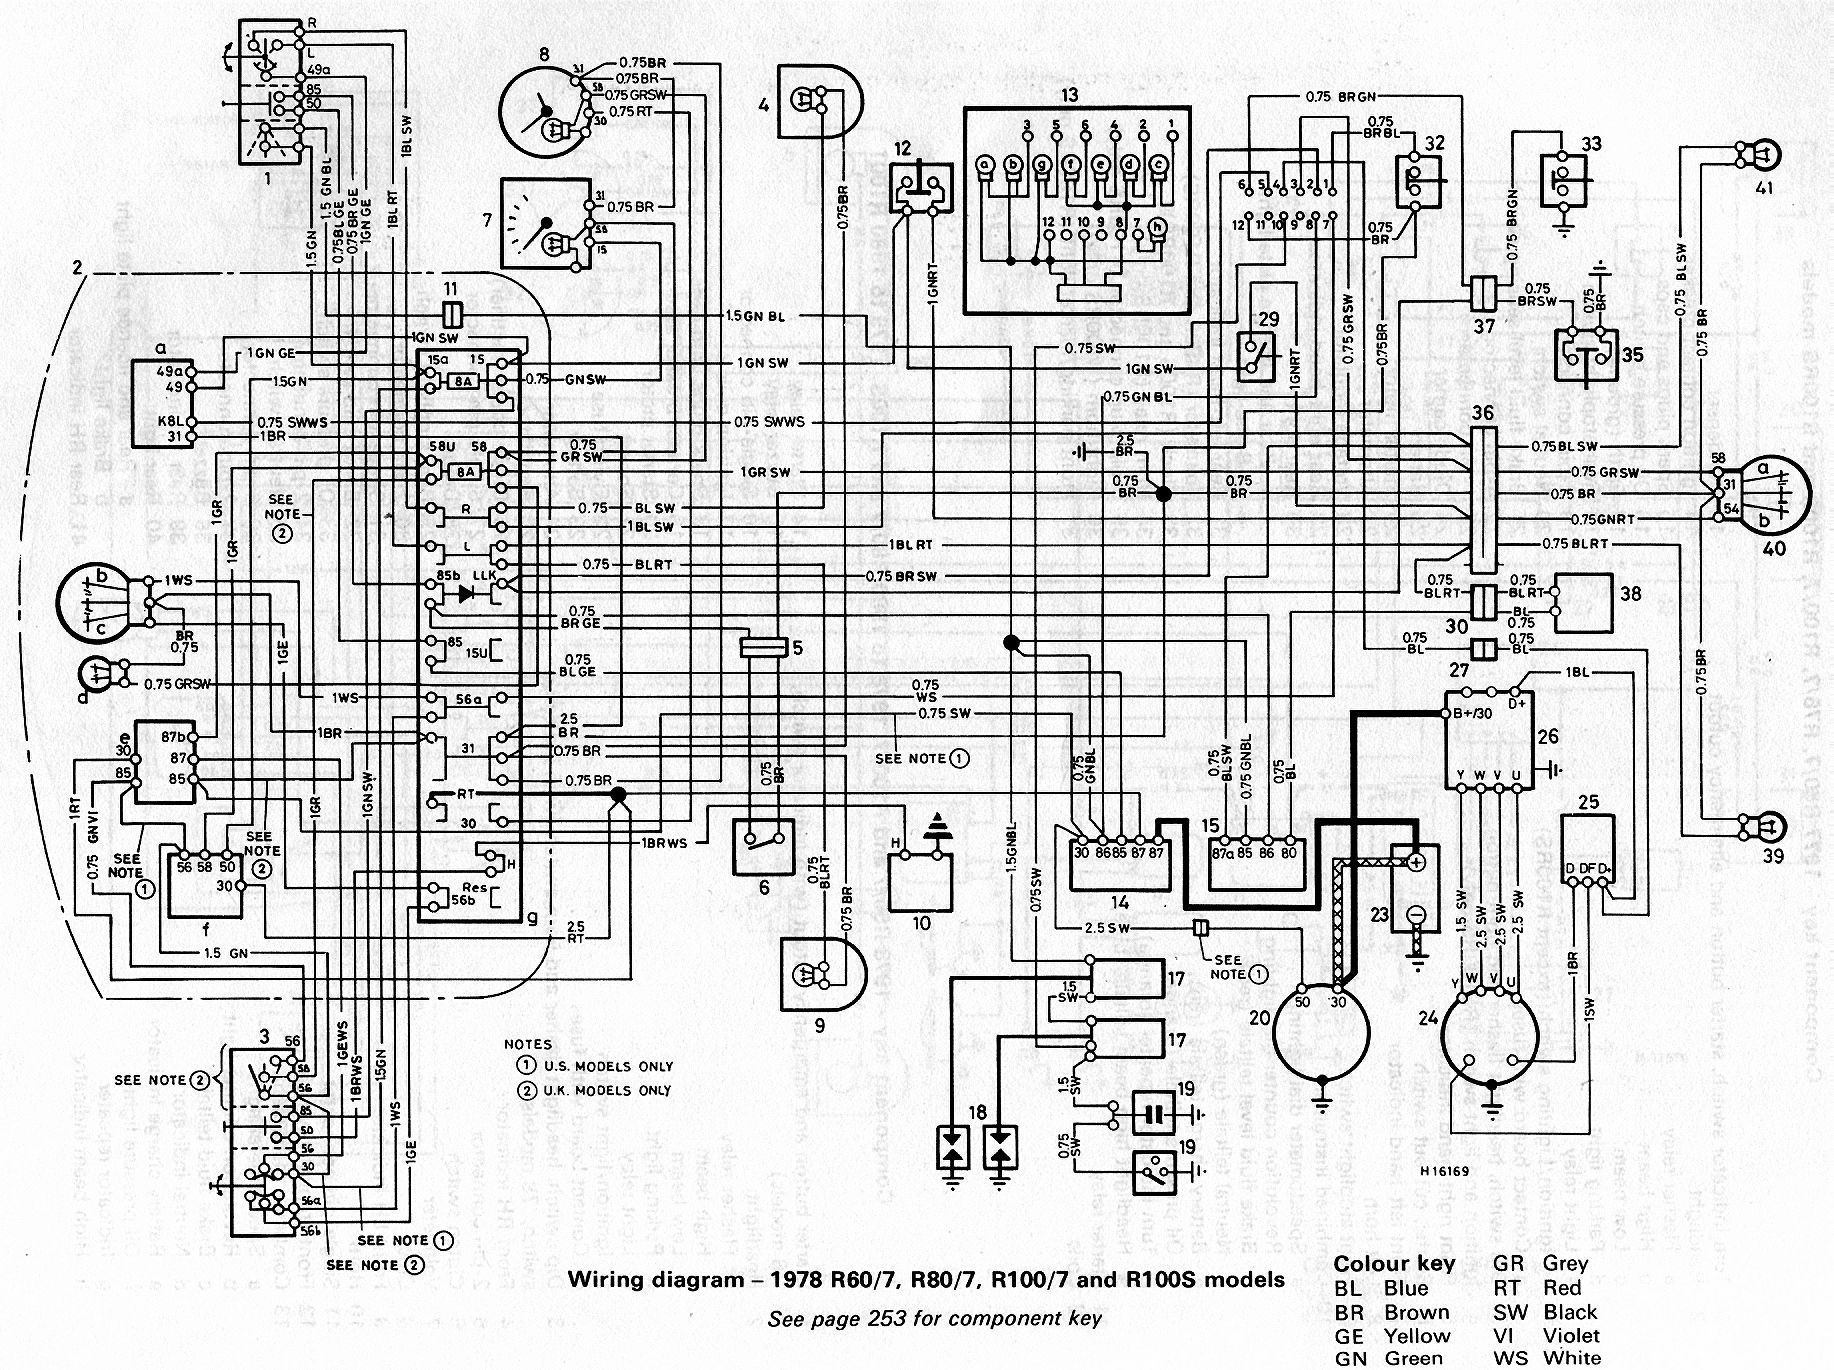 Admirable Bmw 1150 Gs Wiring Diagram Wiring Library Wiring Cloud Uslyletkolfr09Org